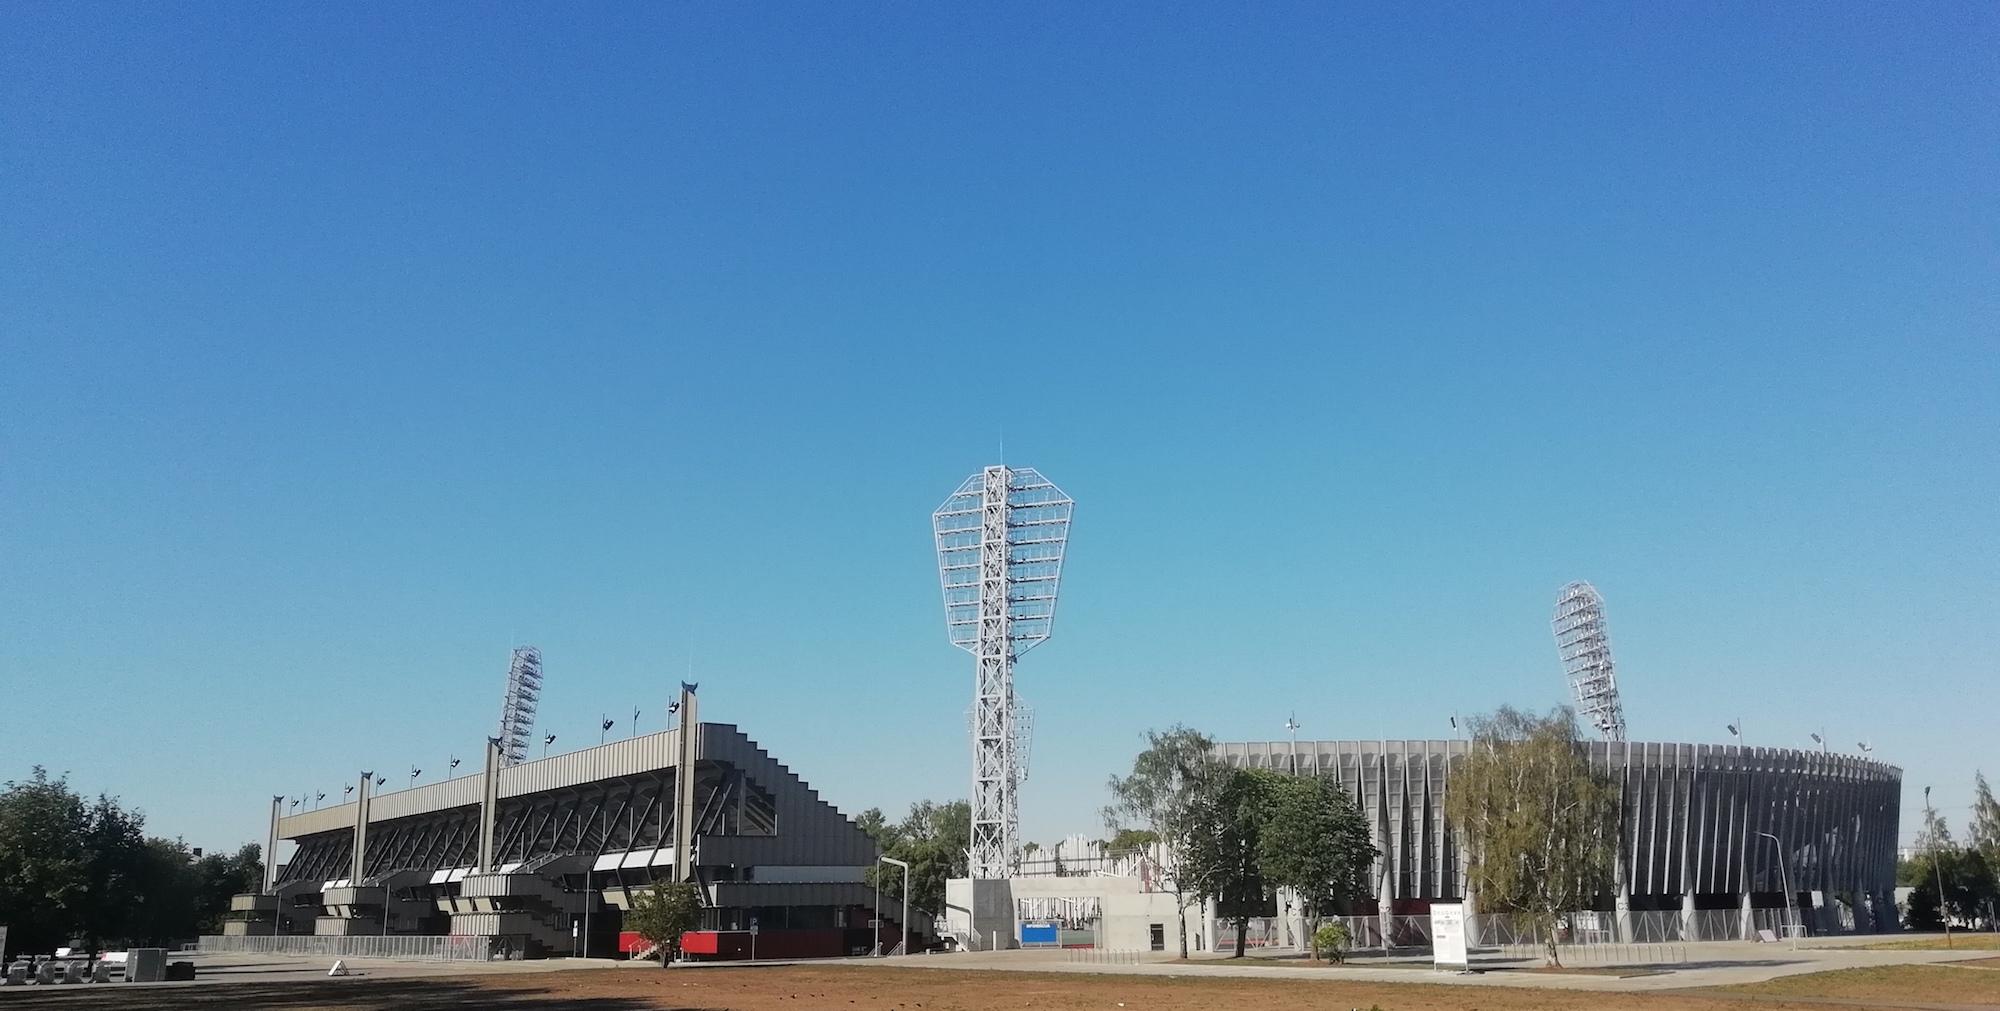 Daugavas stadium in Riga in Grizinkalns neighborhood